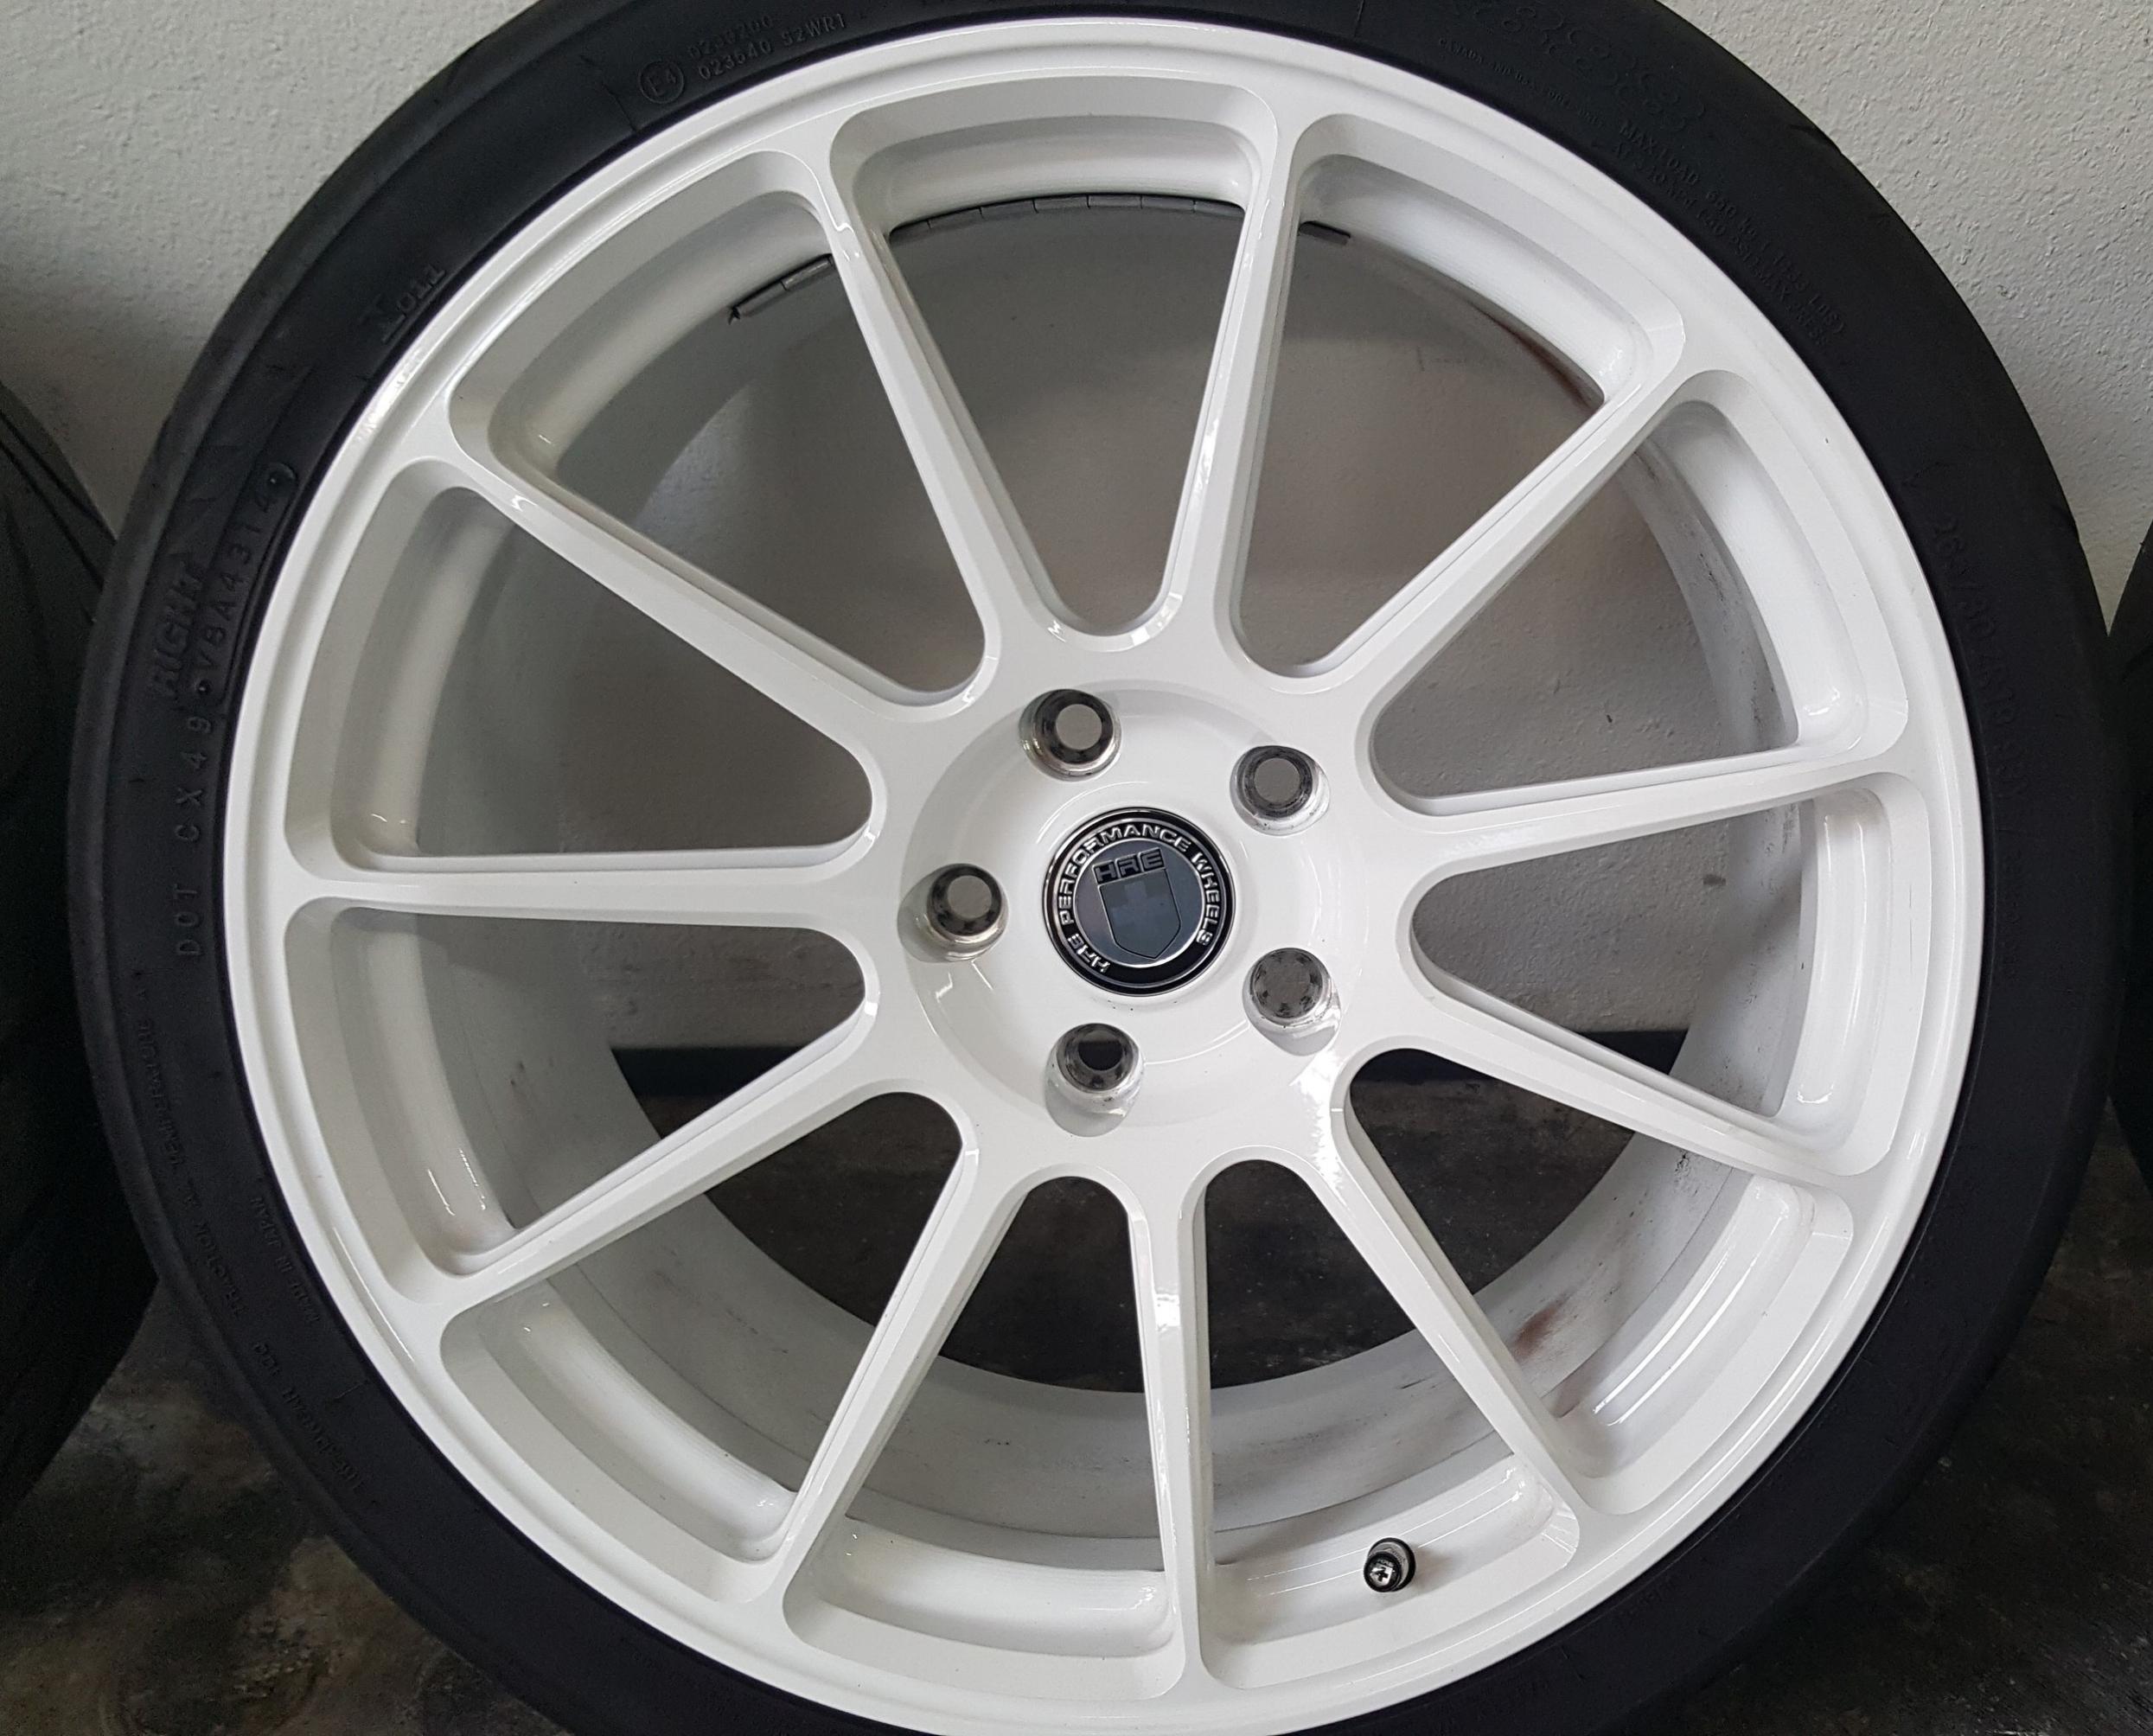 hre-wheels-white